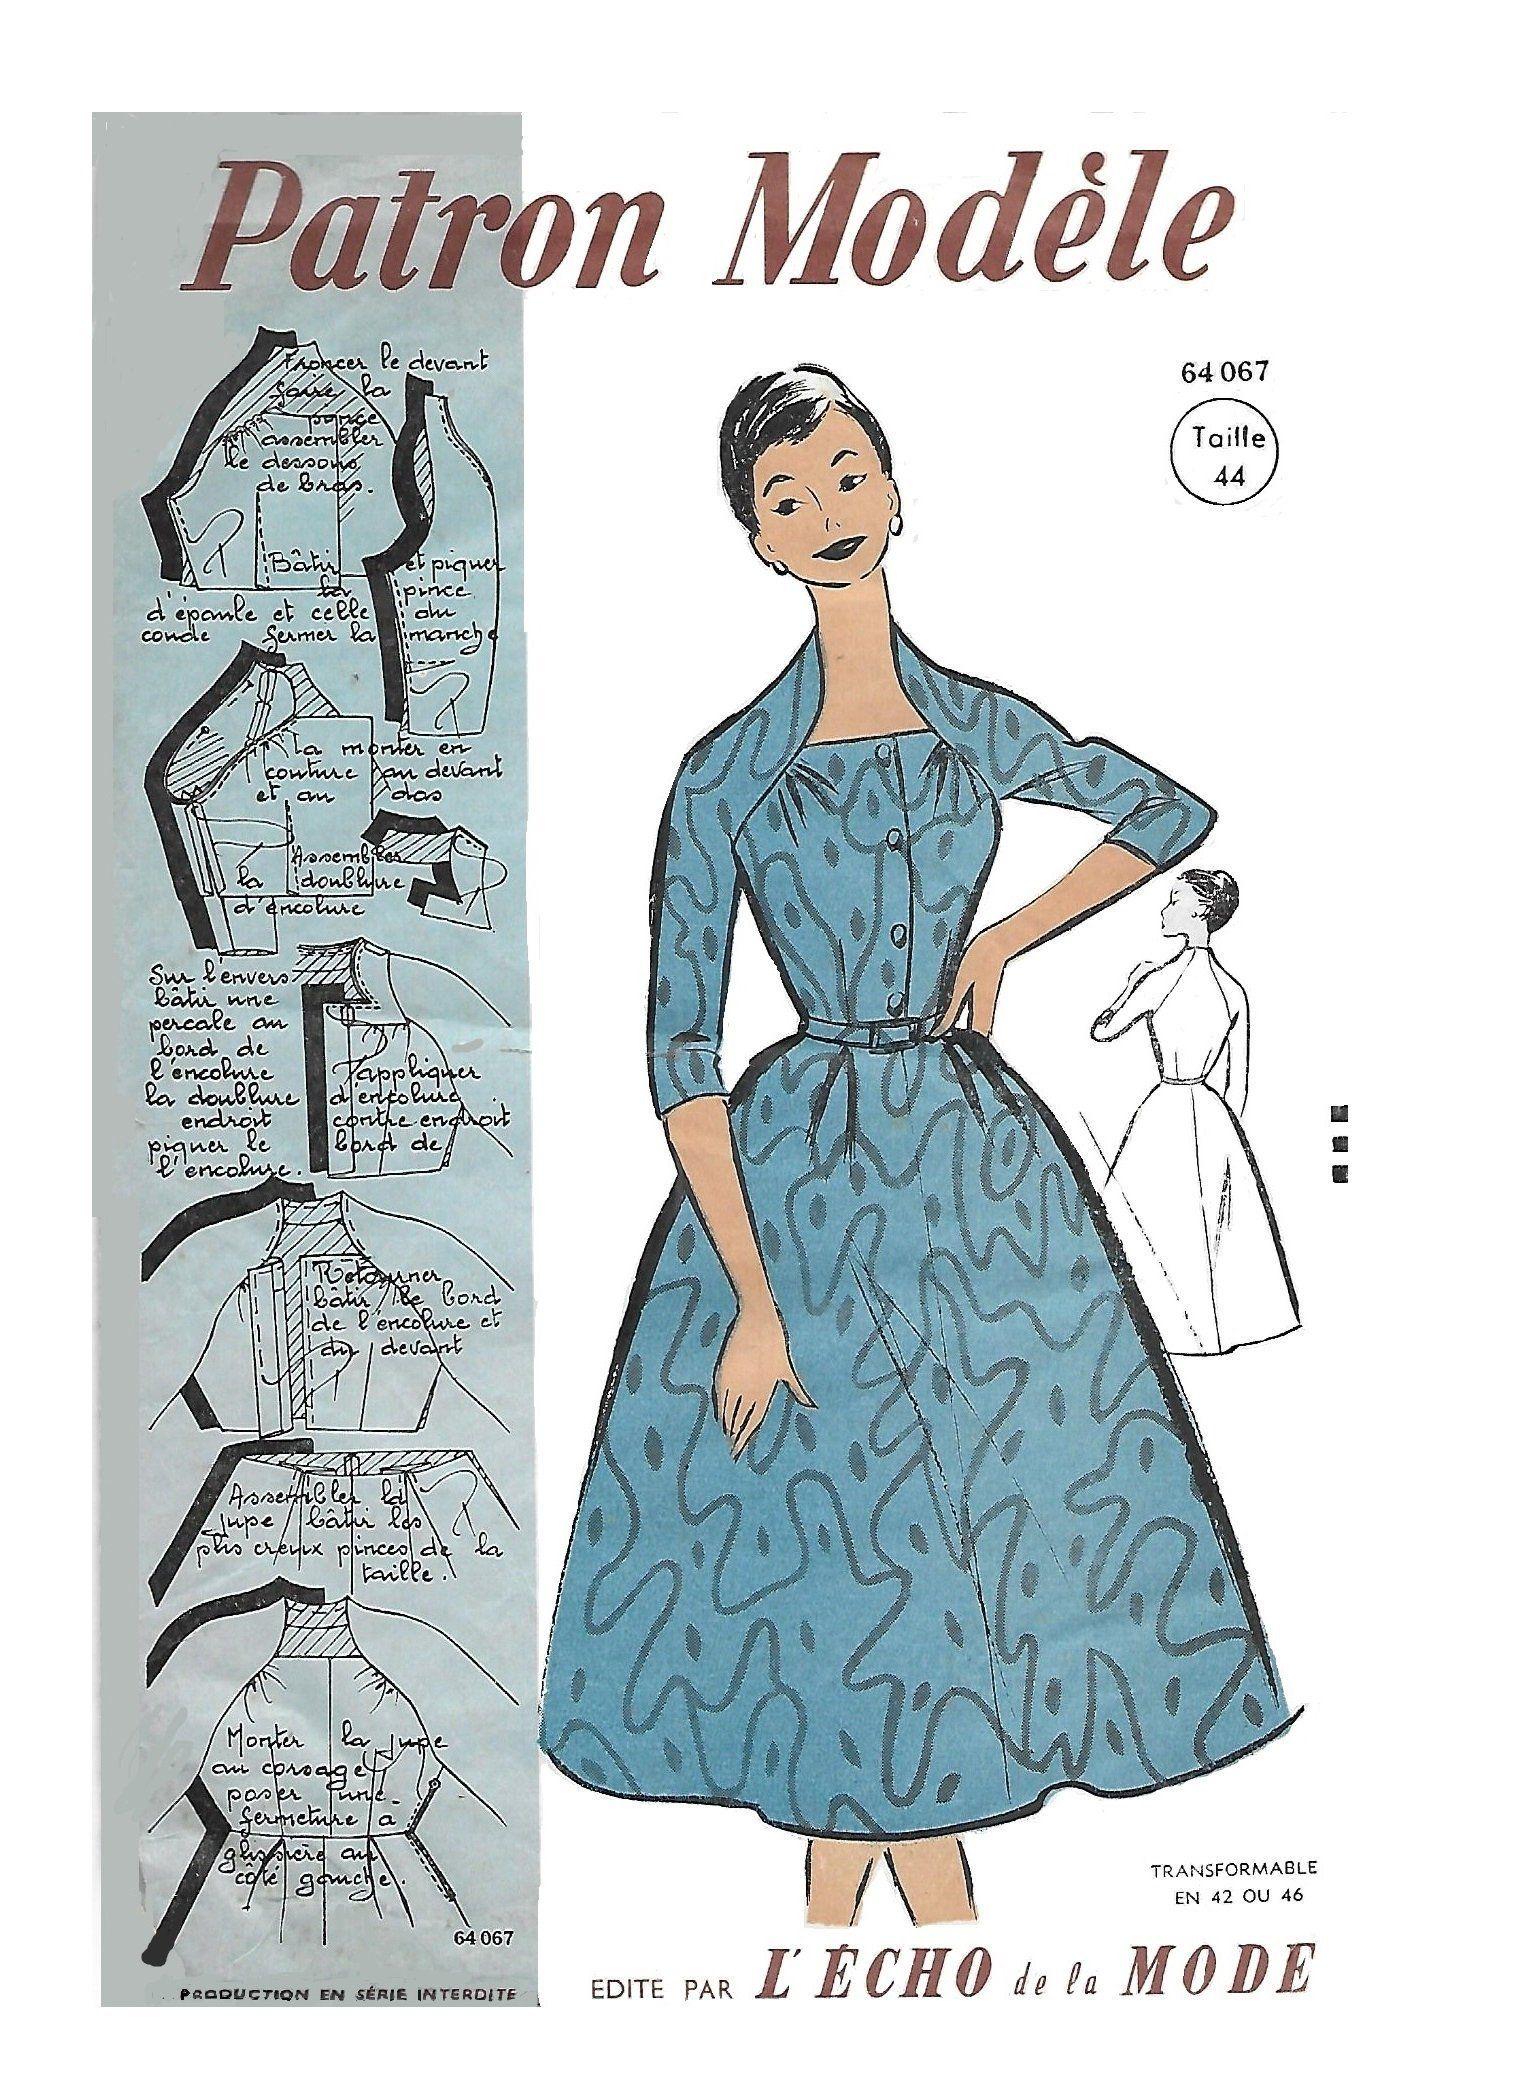 French Sewing Patterns : french, sewing, patterns, Patron, Modele, 64067, Women's, 1950s, Dress, Unprinted, French, Sewing, Pattern, 37.79, Patterns,, Dress,, Womens, Patterns